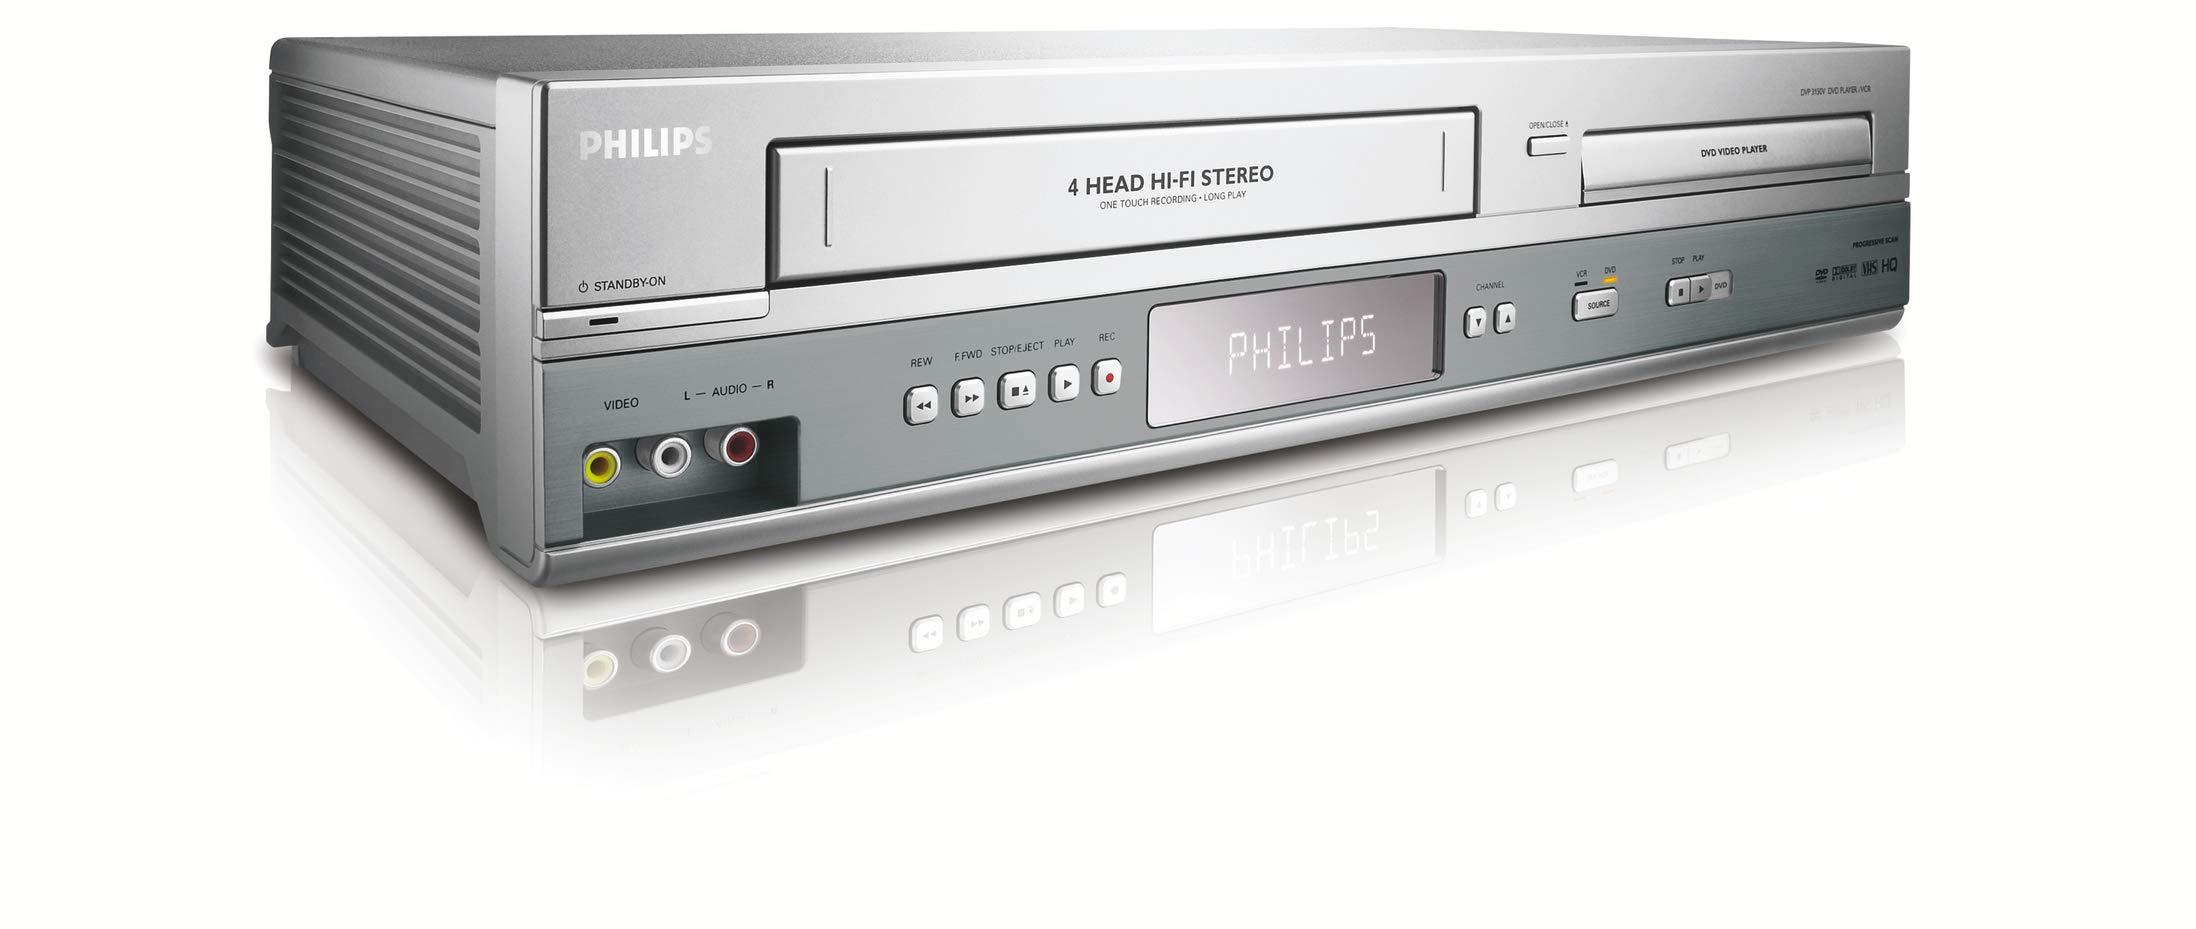 Philips DVP3150V HiFi DVD/VCR Combo by PHILIPS